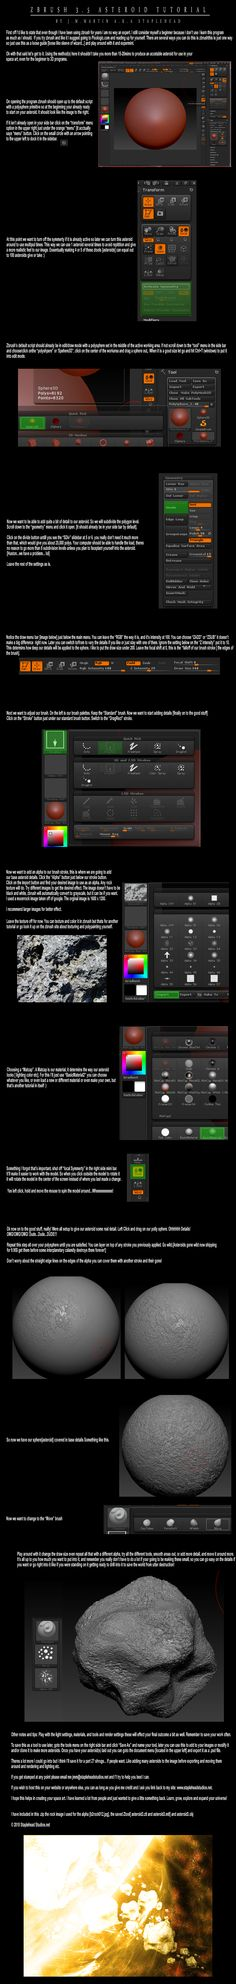 Asteroid Tutorial Zbrush 3.5 by ~StapleDroid on deviantART